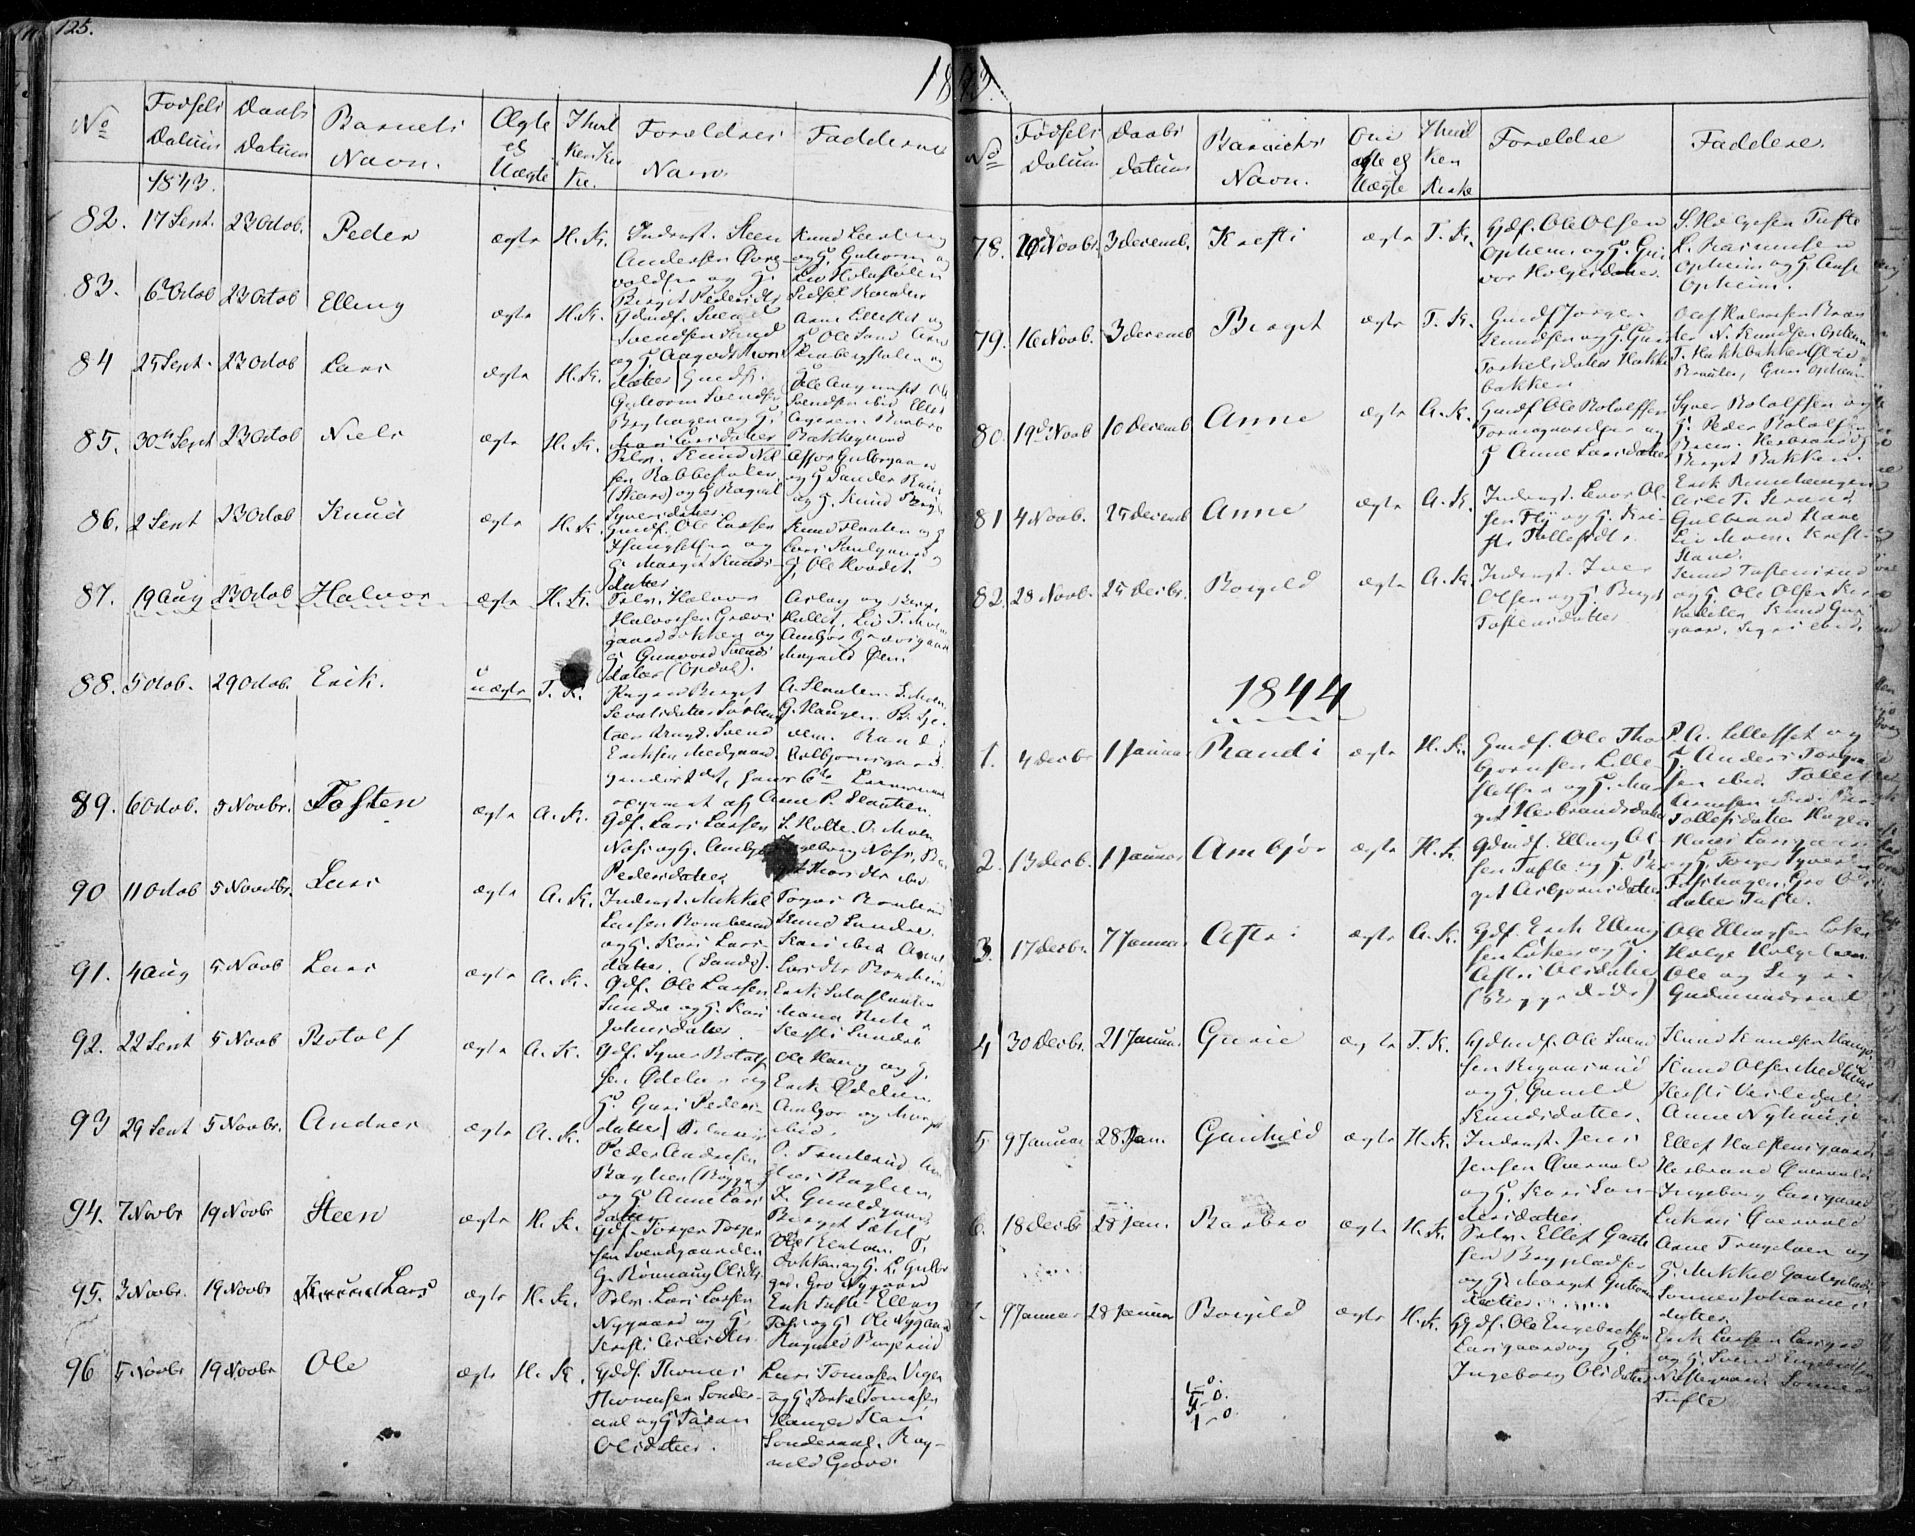 SAKO, Ål kirkebøker, F/Fa/L0005: Ministerialbok nr. I 5, 1825-1848, s. 125